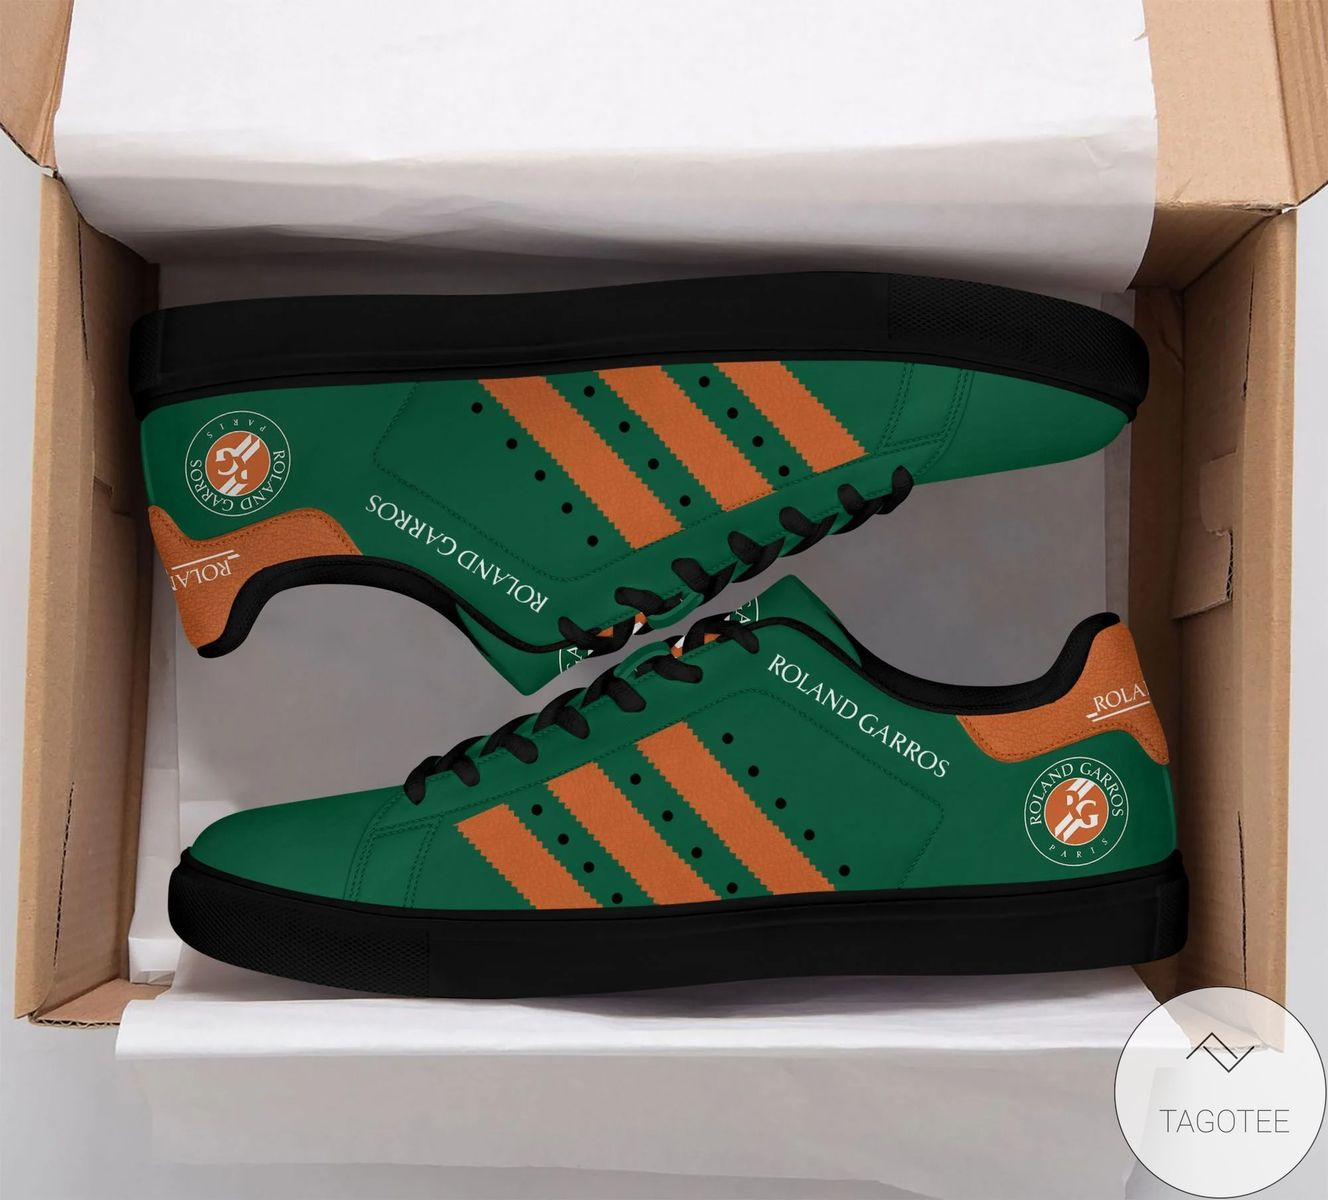 Roland Garros Stan Smith Shoes